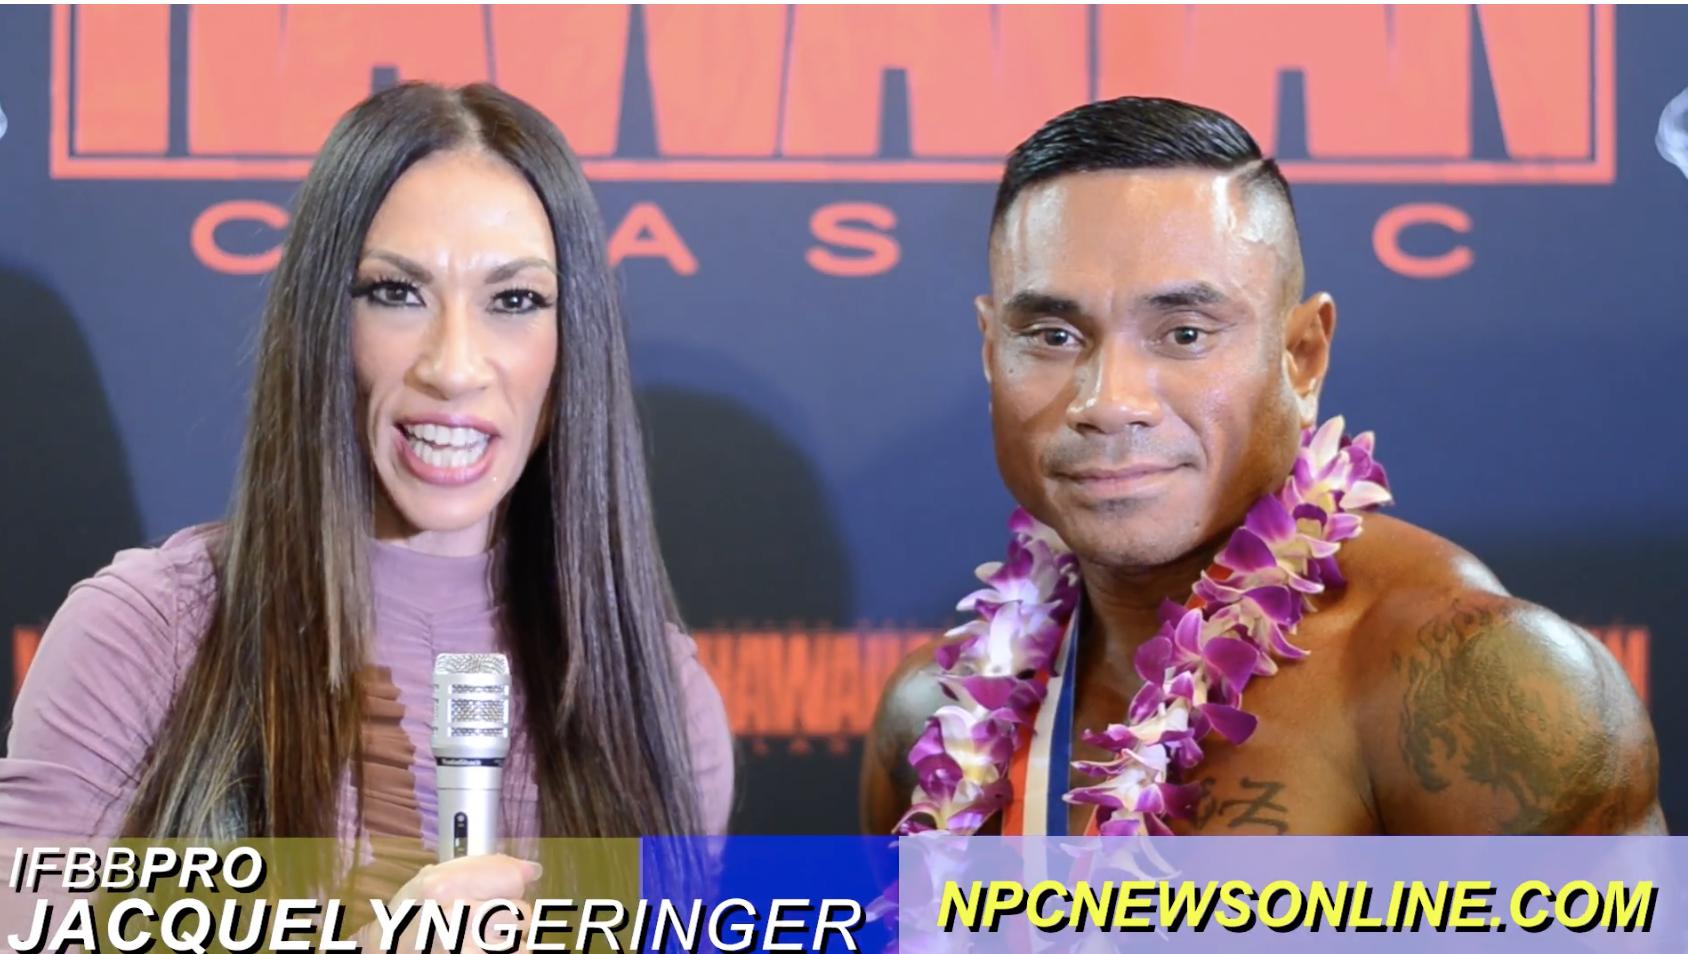 2017 NPC Shawn Ray Hawaiian Classic Masters Bodybuilding Overall Winner